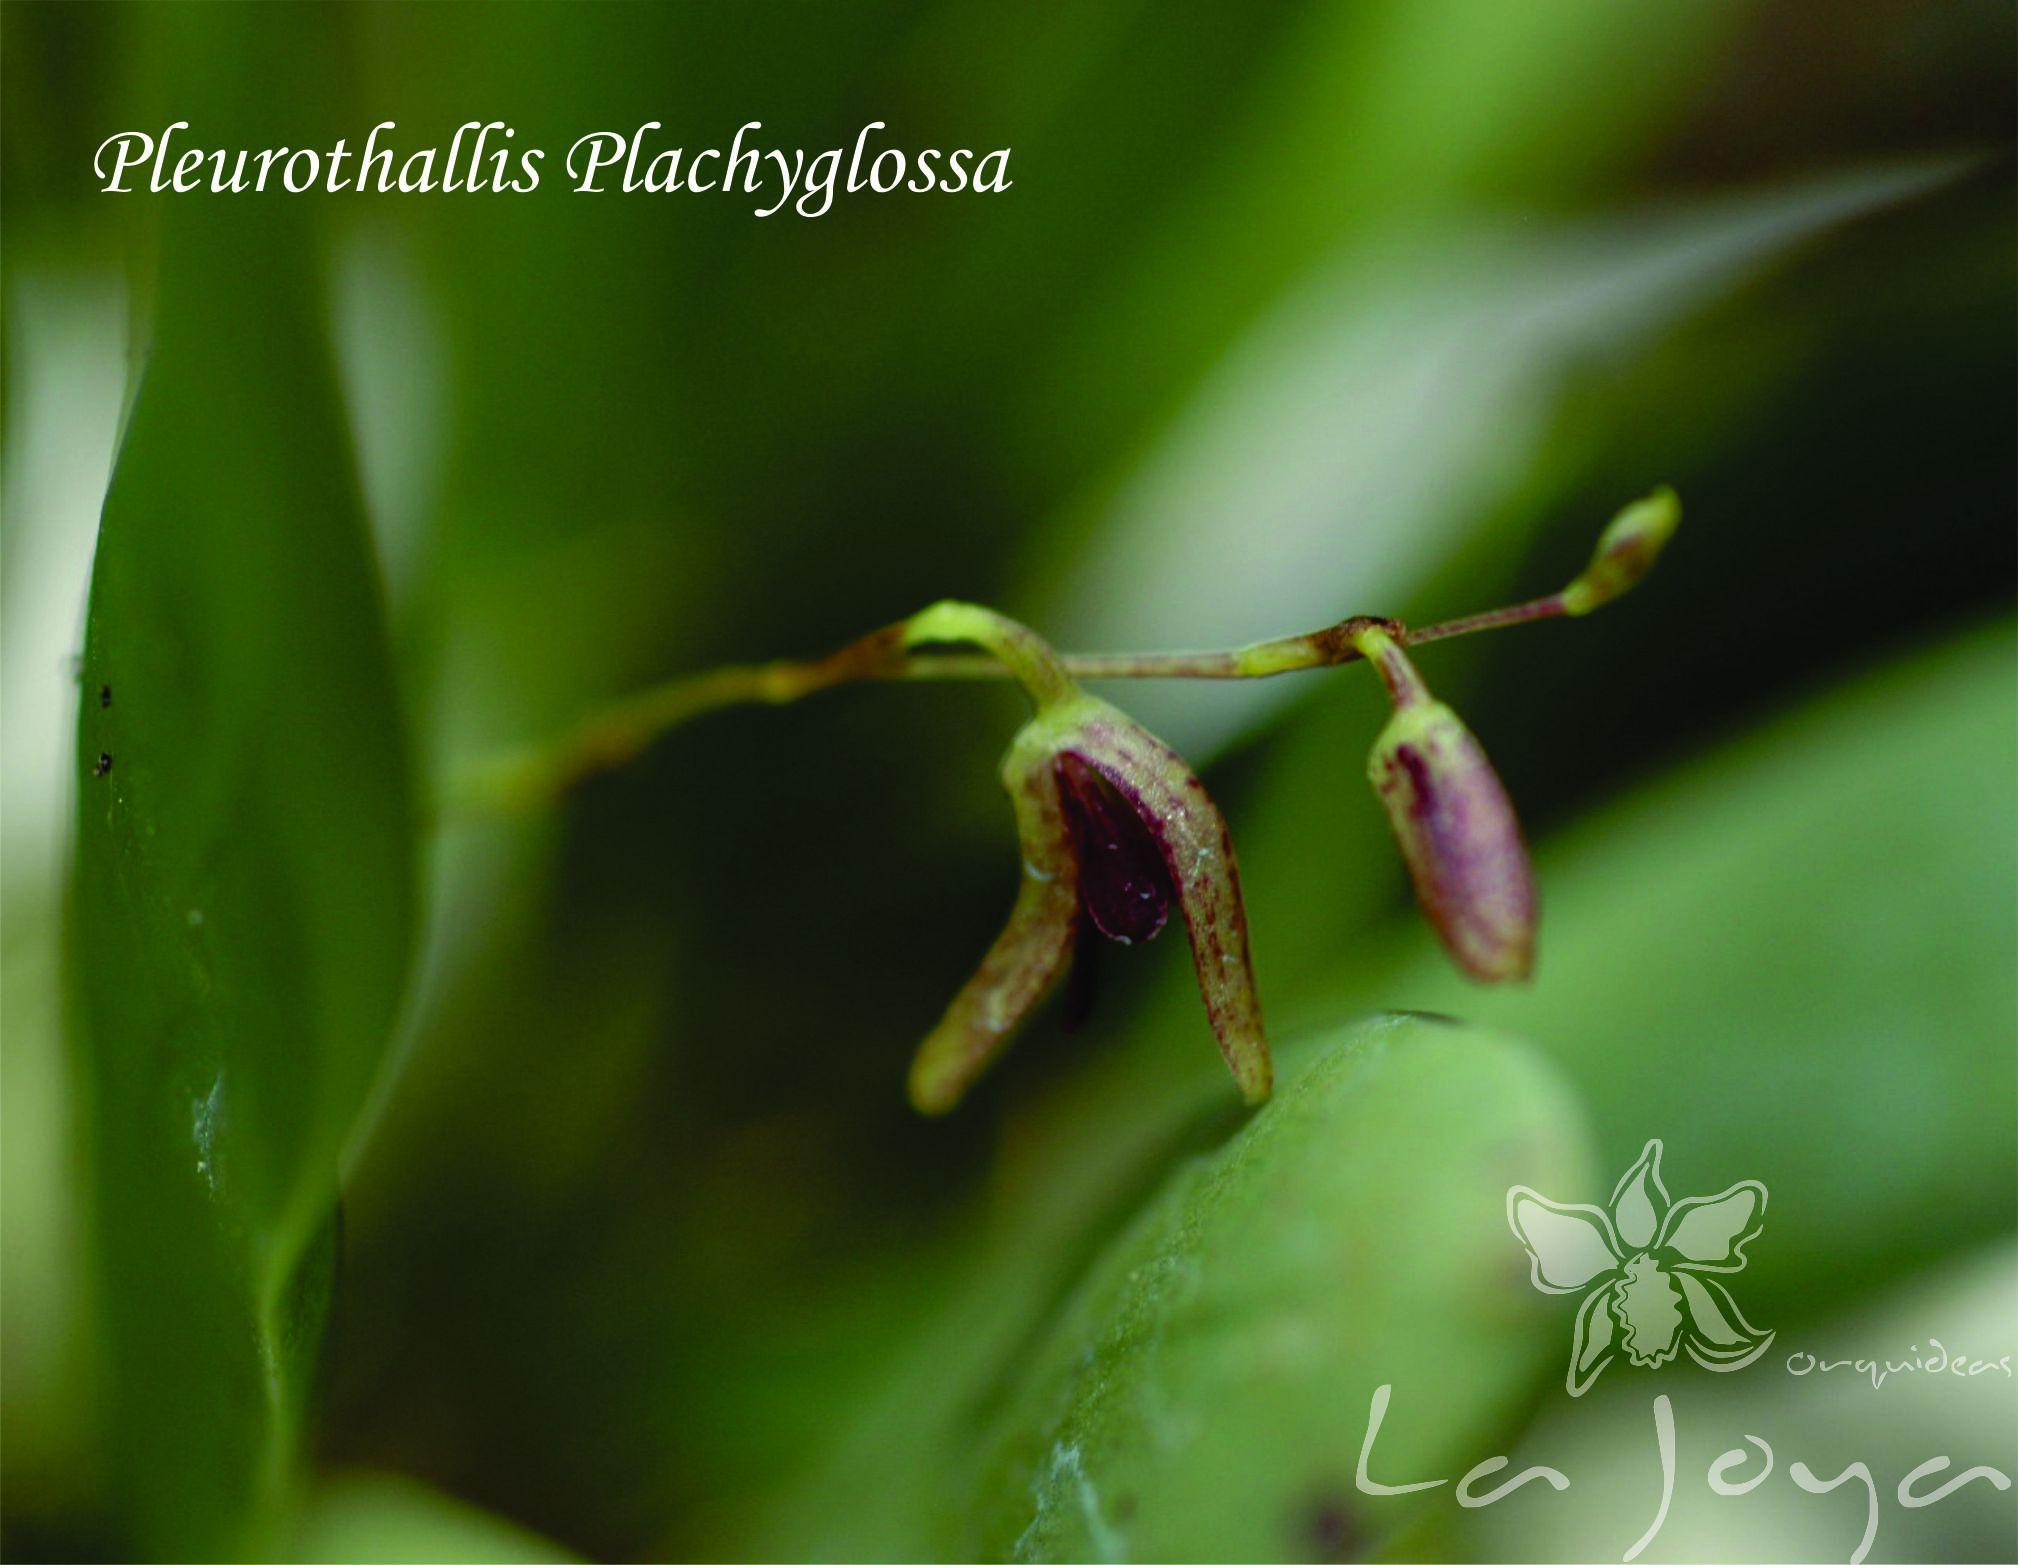 Pleurothallis Pachyglossa